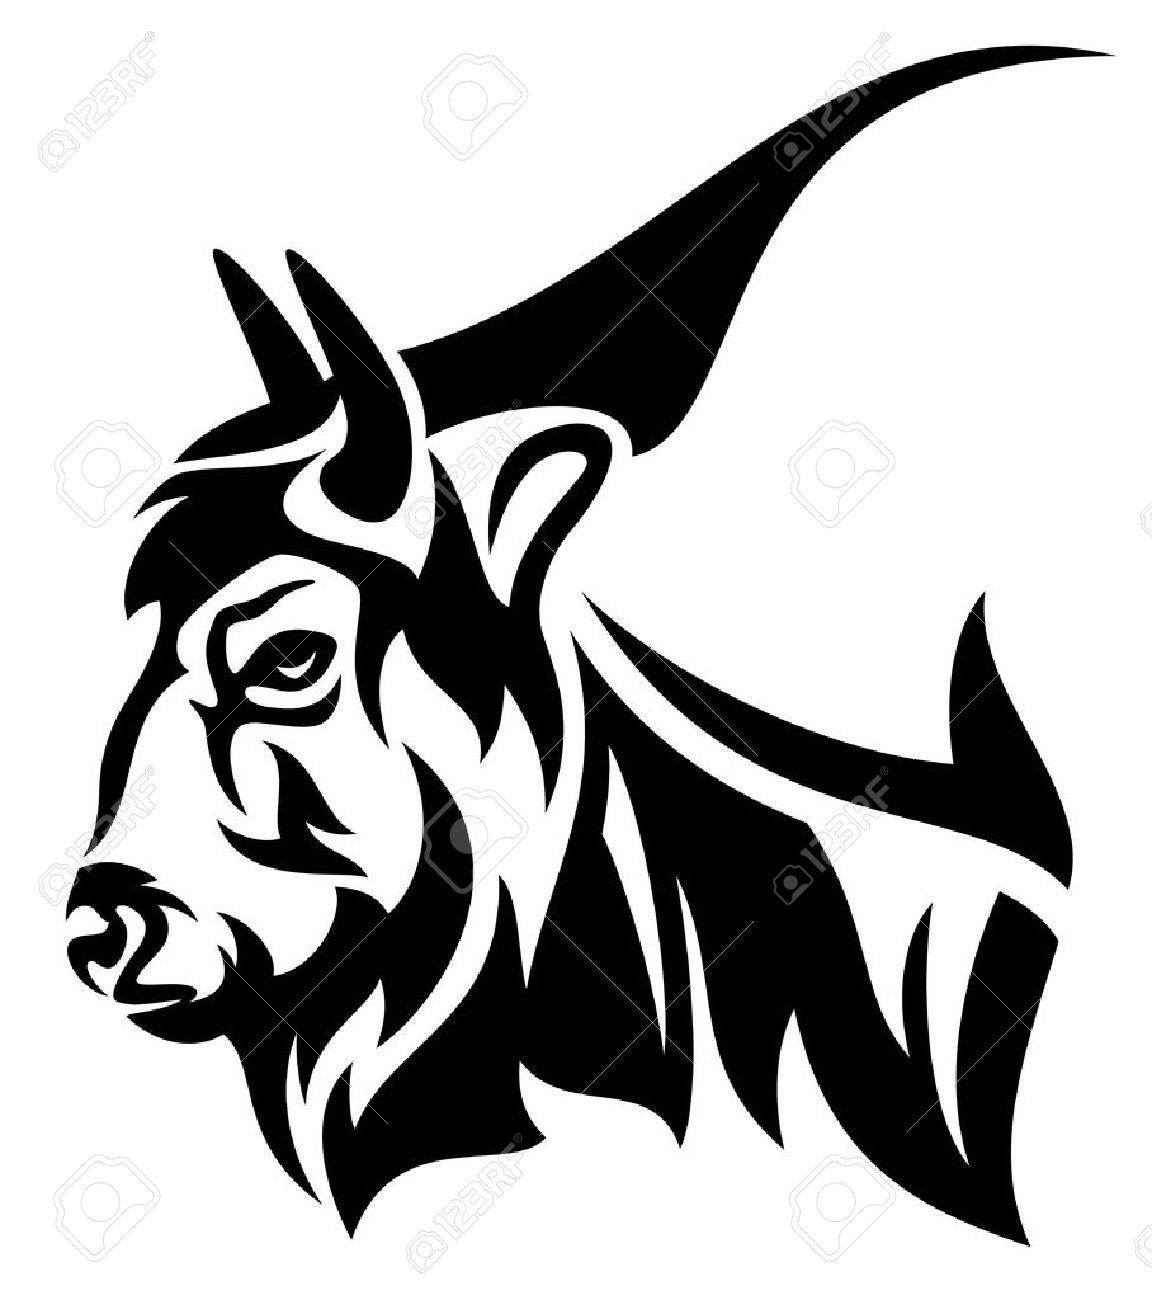 Bison clipart bufallo. Buffalo head free download